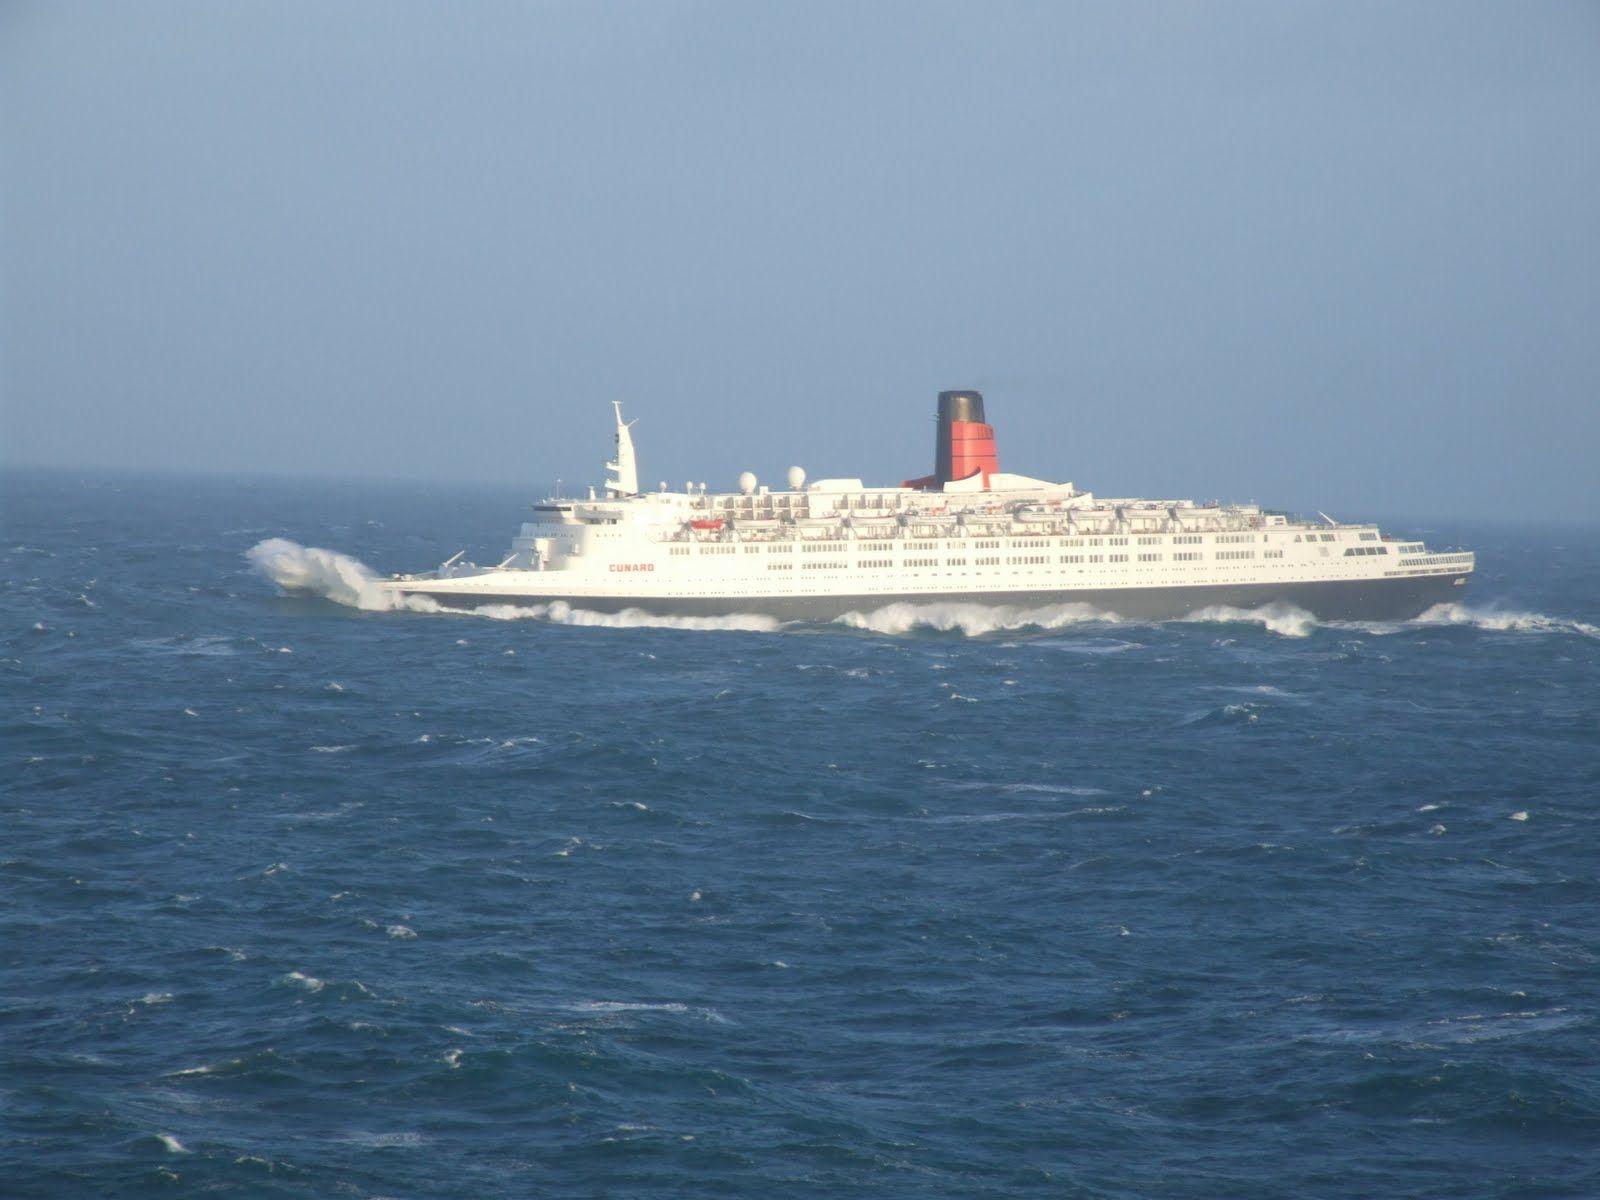 Rough Seas Queen Elizabeth Liners Pinterest Queen - Cruise ship in rough waters